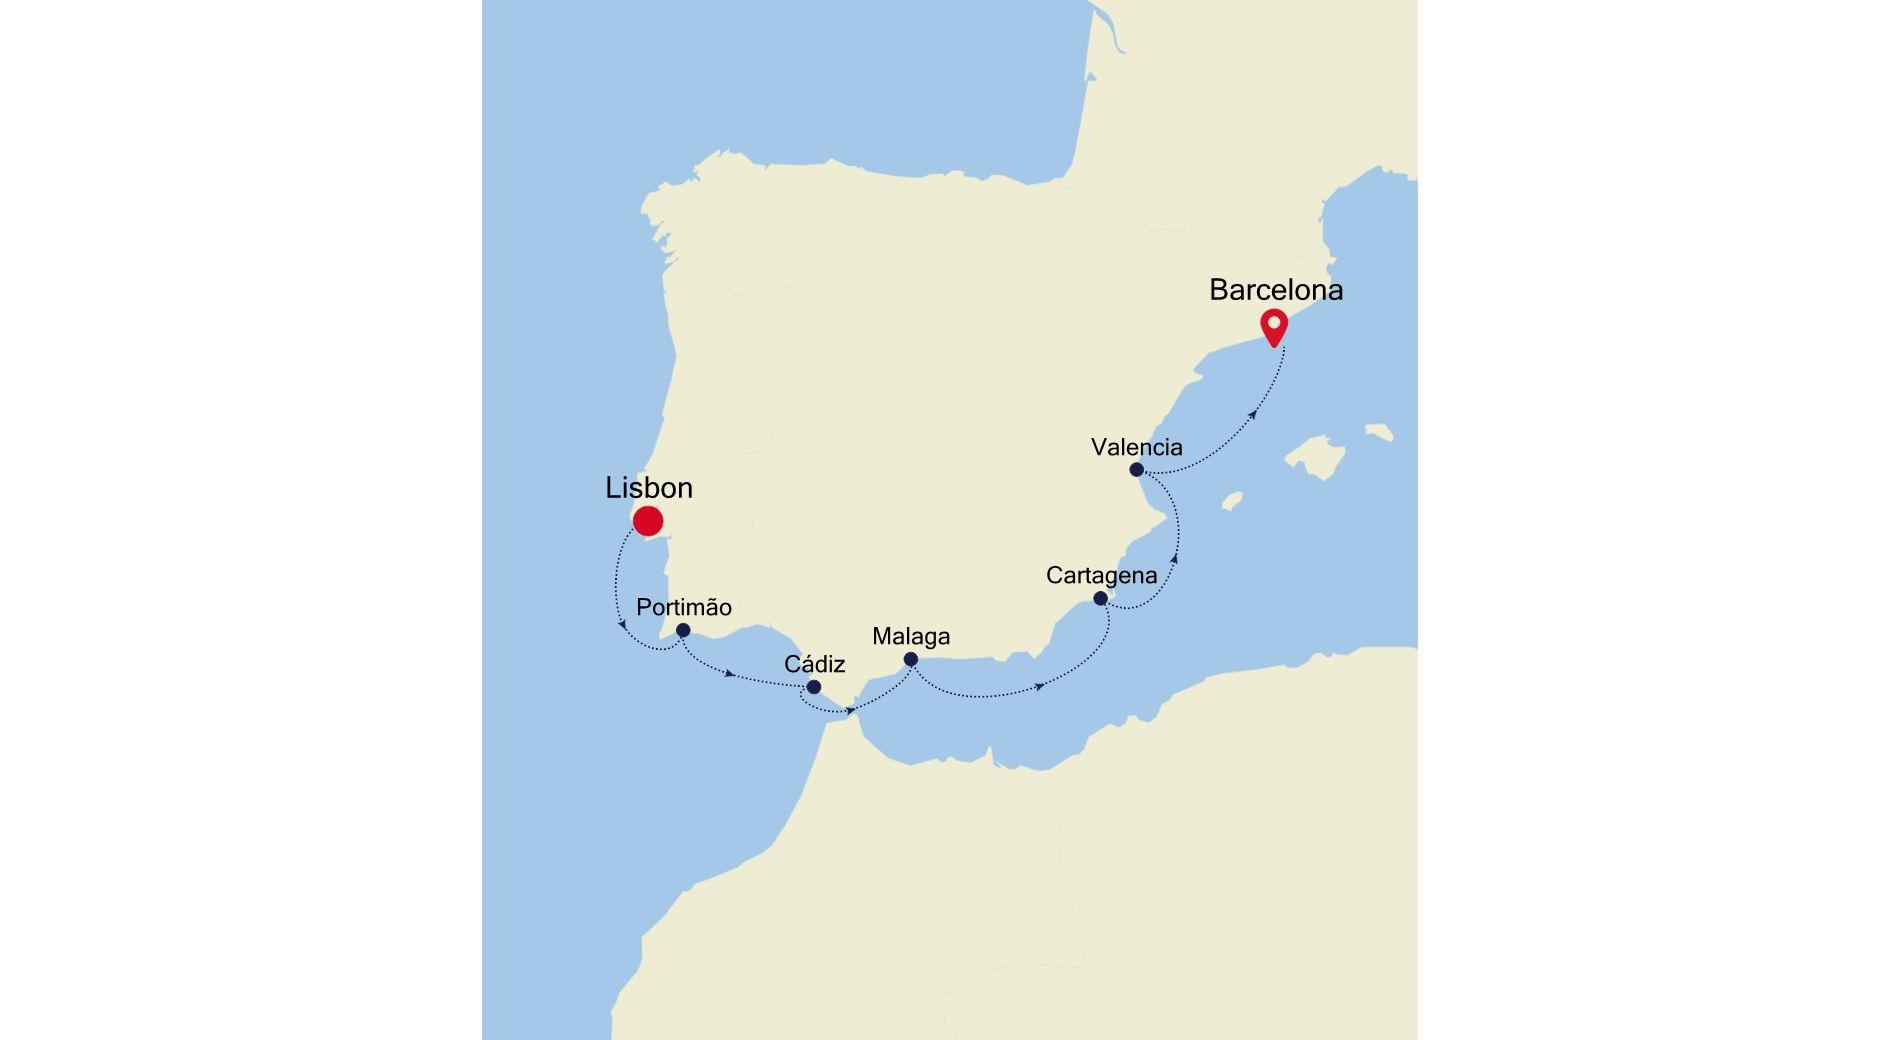 SS200409007 - Lisbon a Barcelona